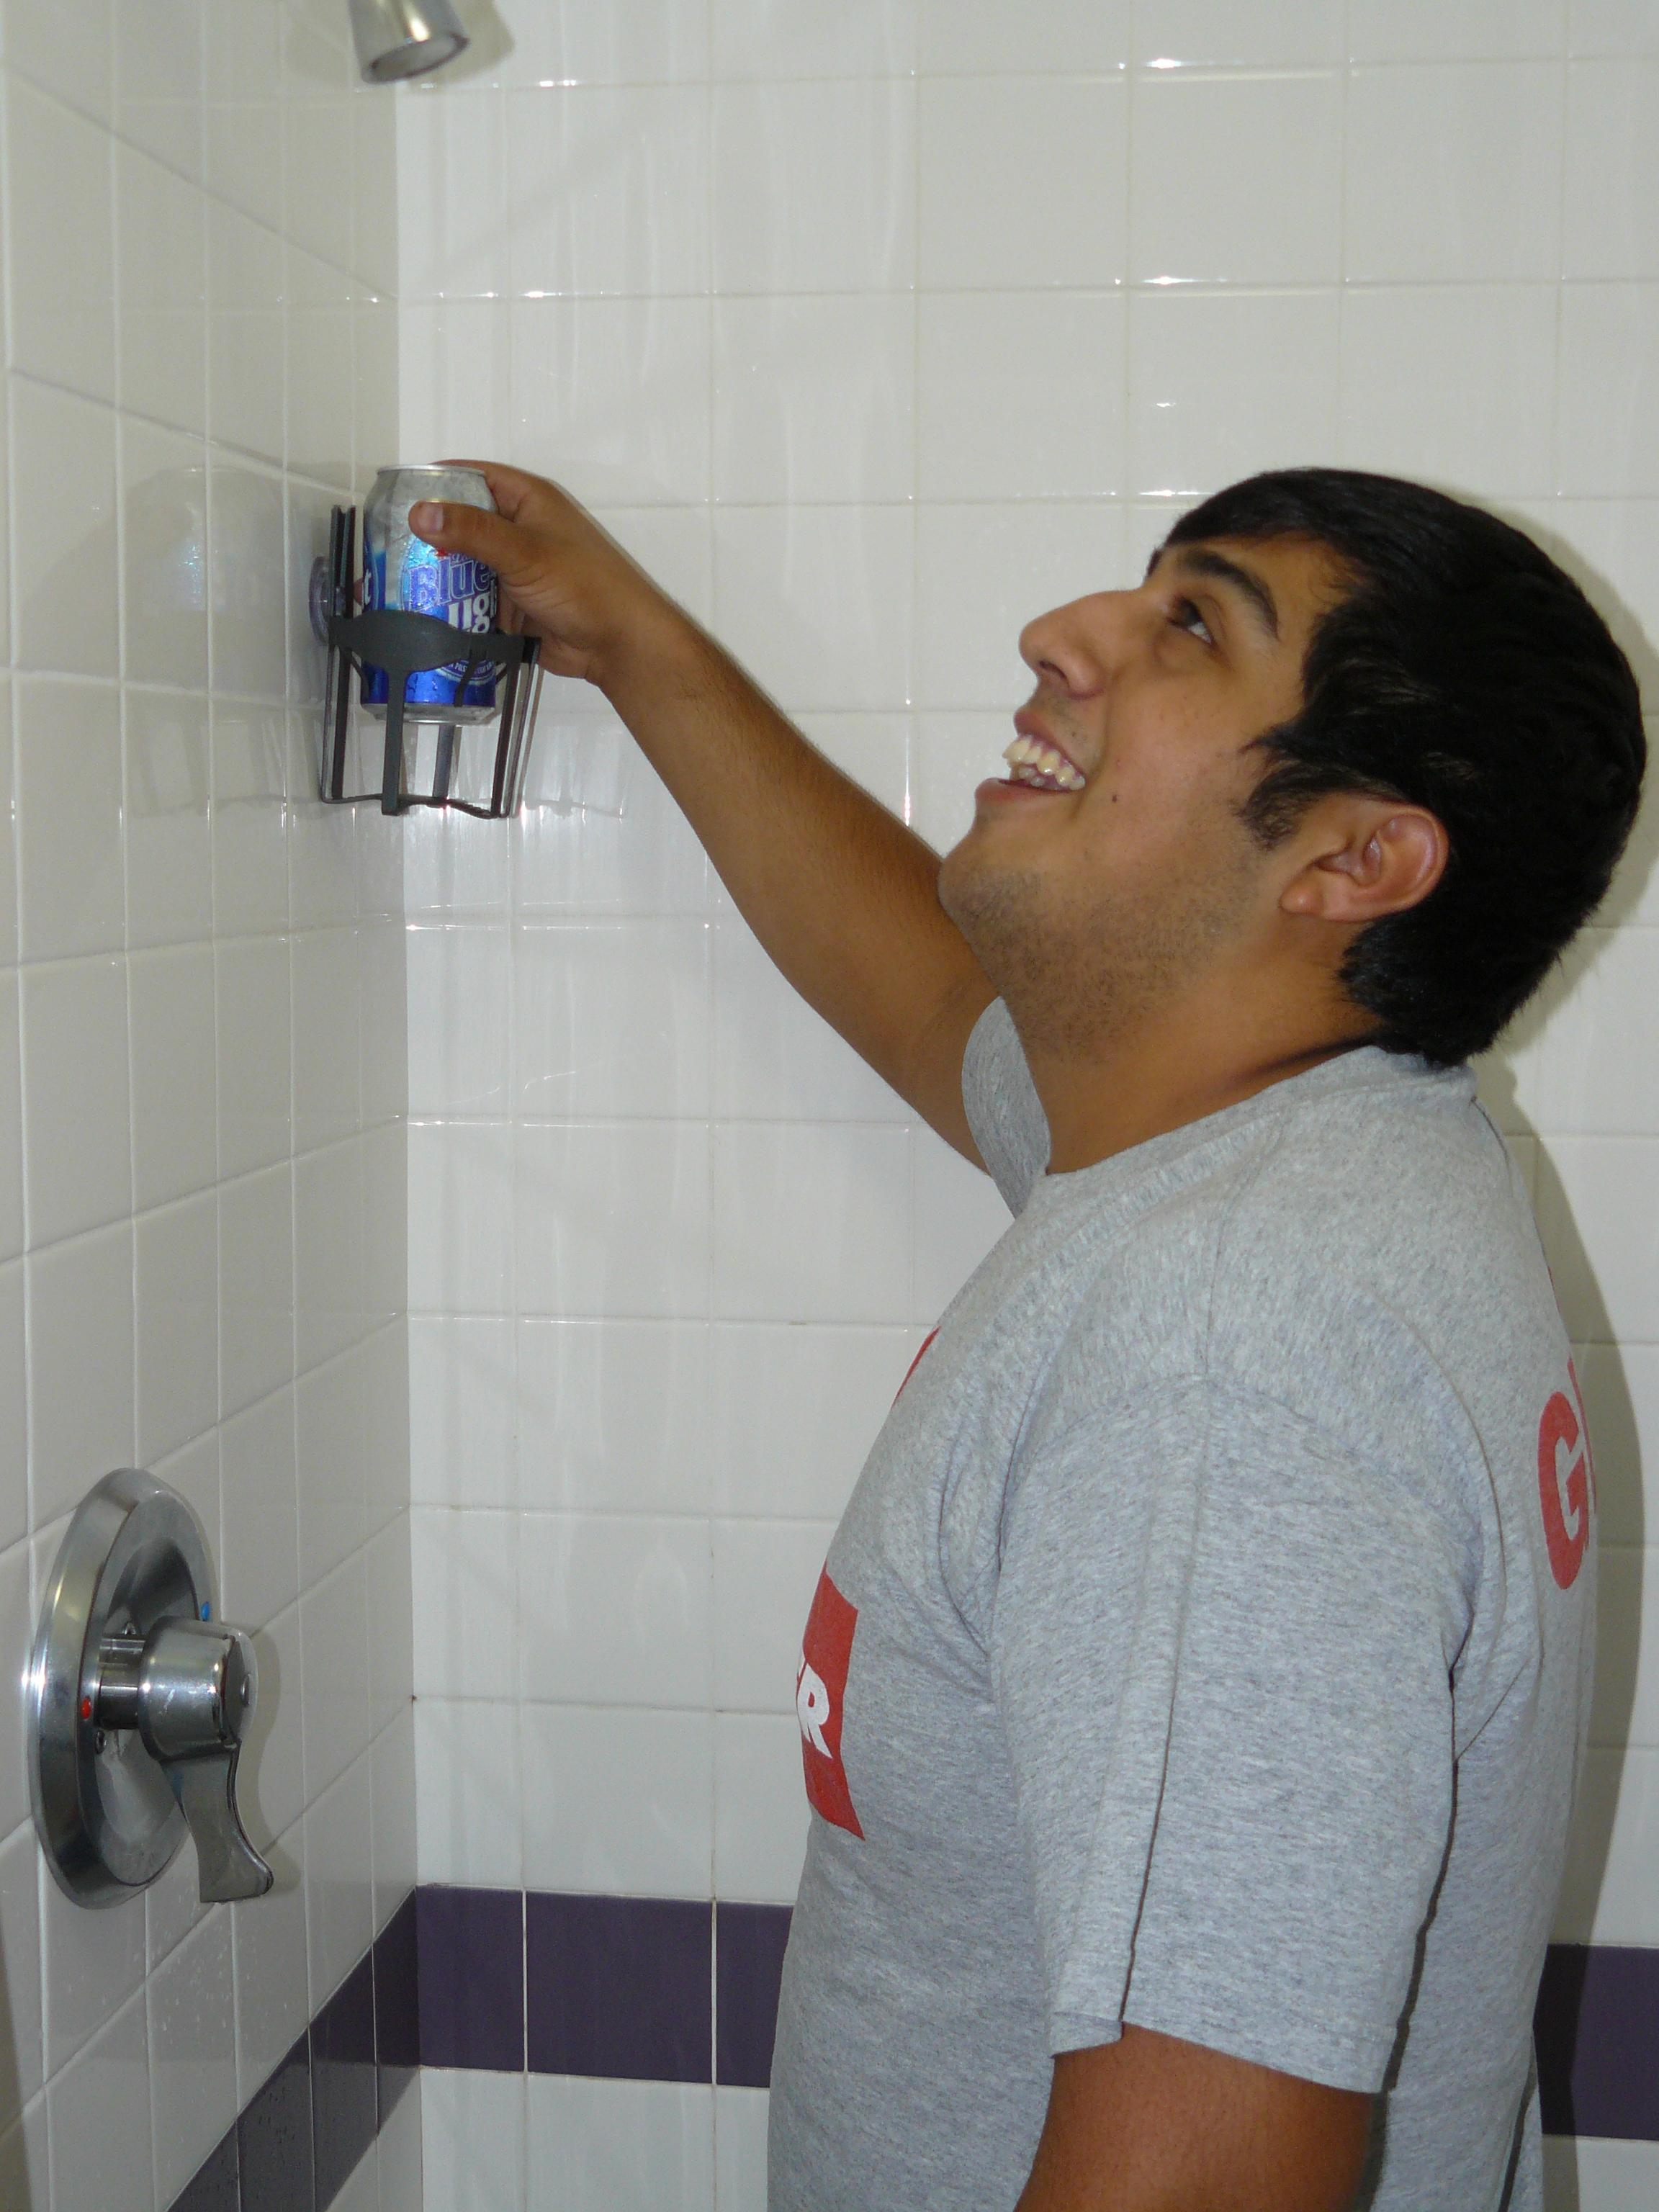 Beer Holder for the Shower